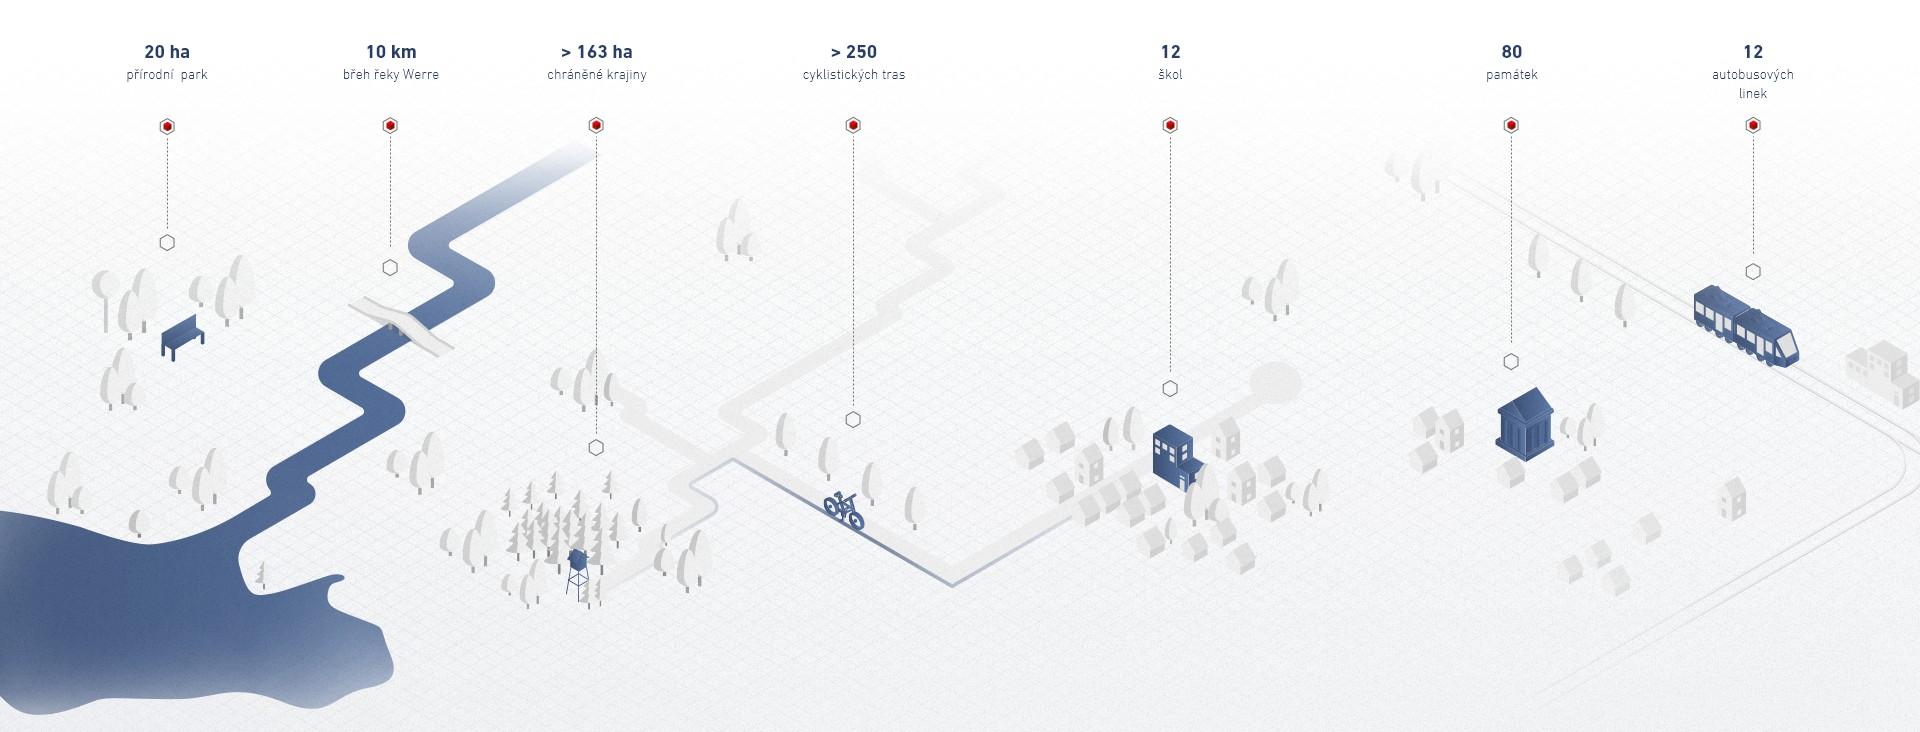 location graphic löhne